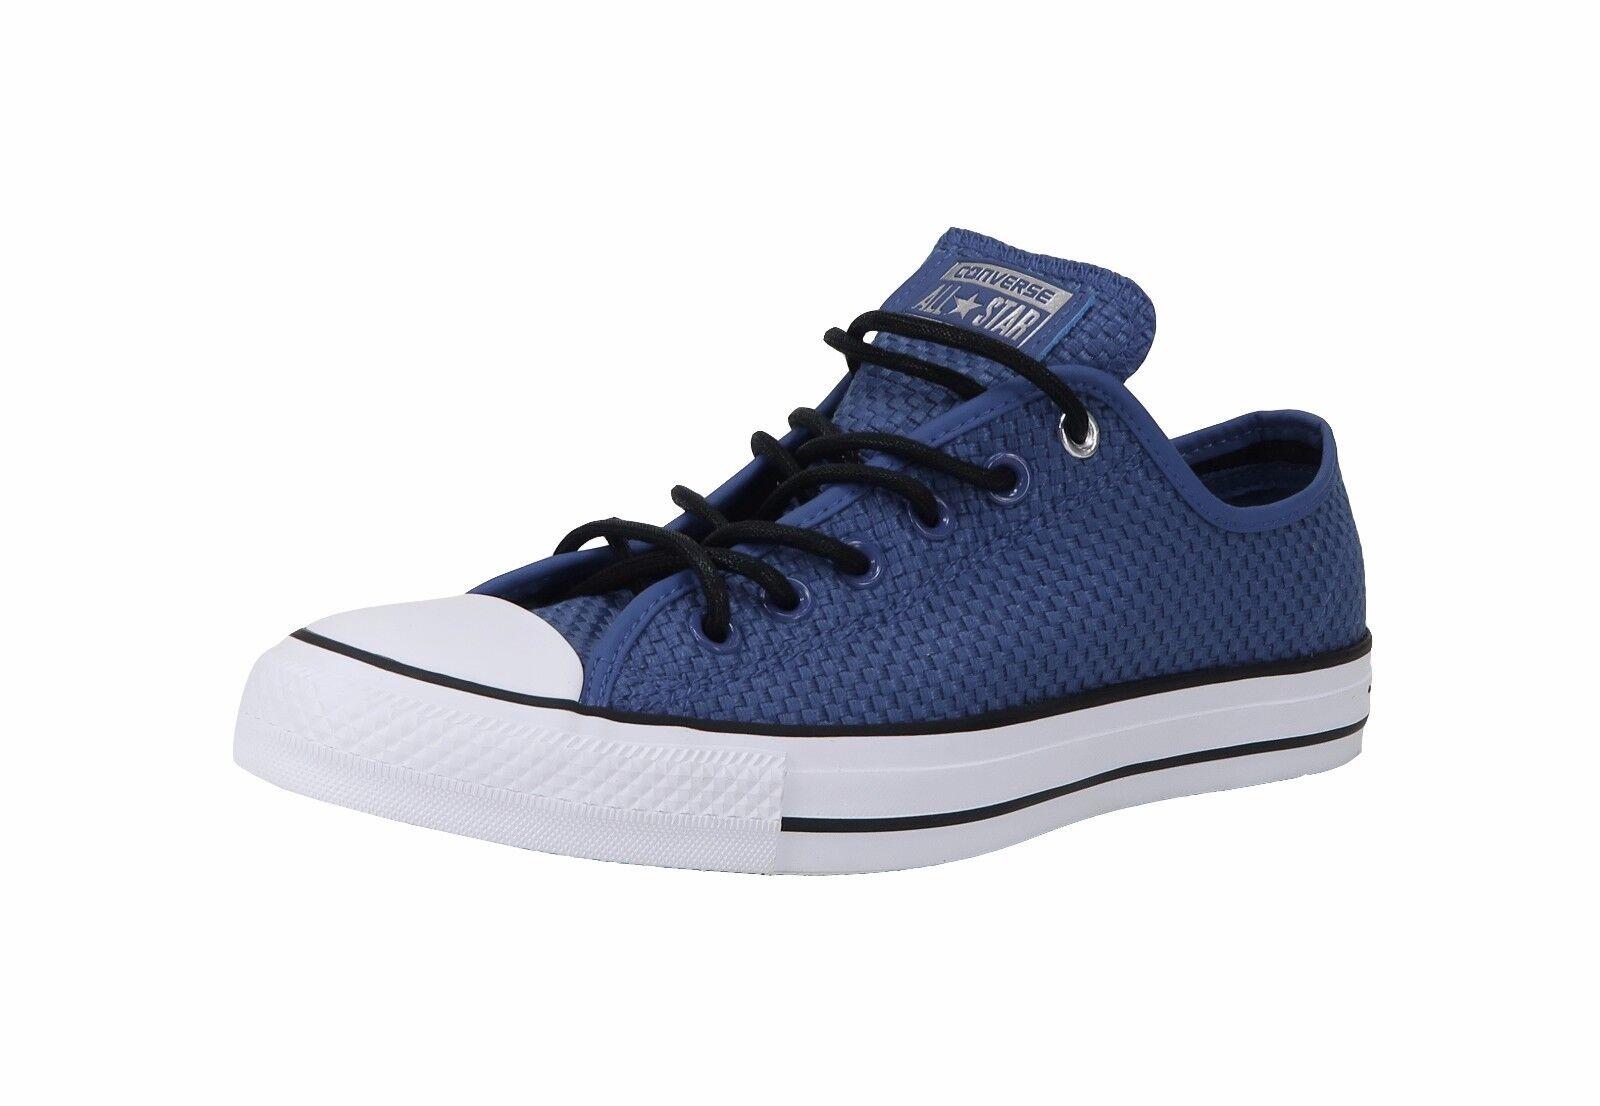 Converse All Shoes Men Women Unisex All Converse Star Chuck Taylor Woven Road Trip Blue White 588d44